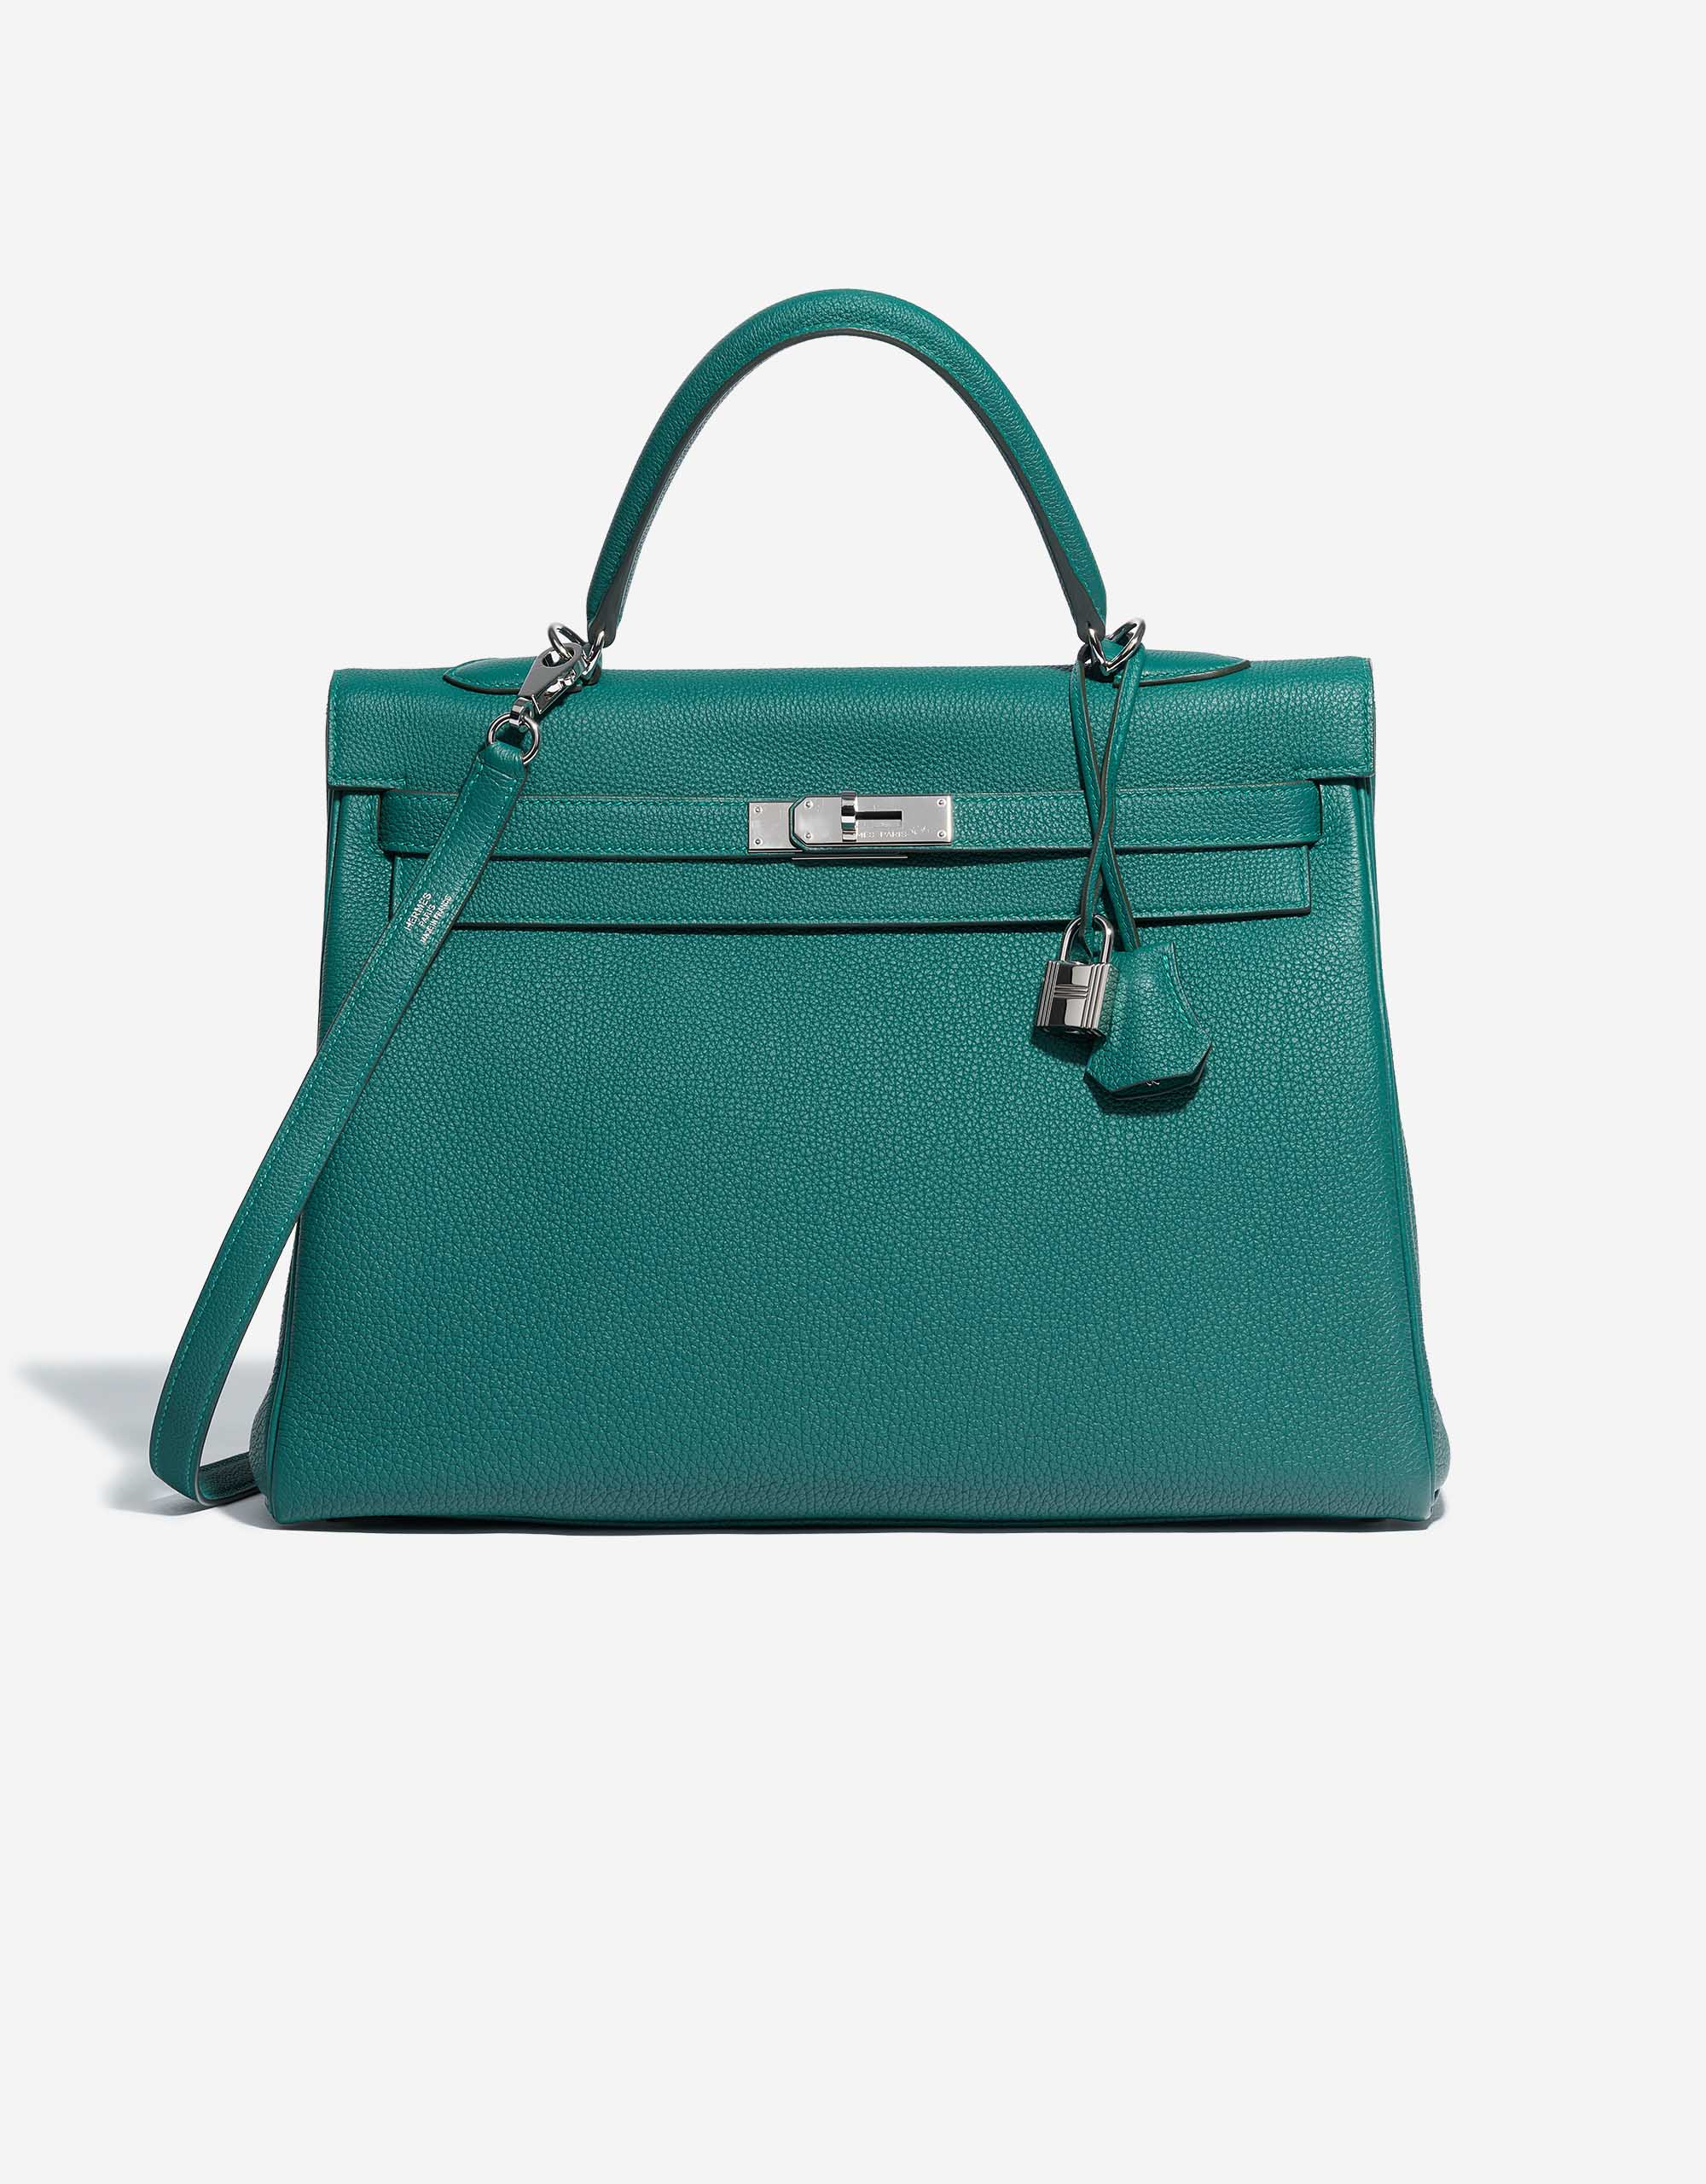 Hermès Kelly 35 Togo Malachite | SACLÀB